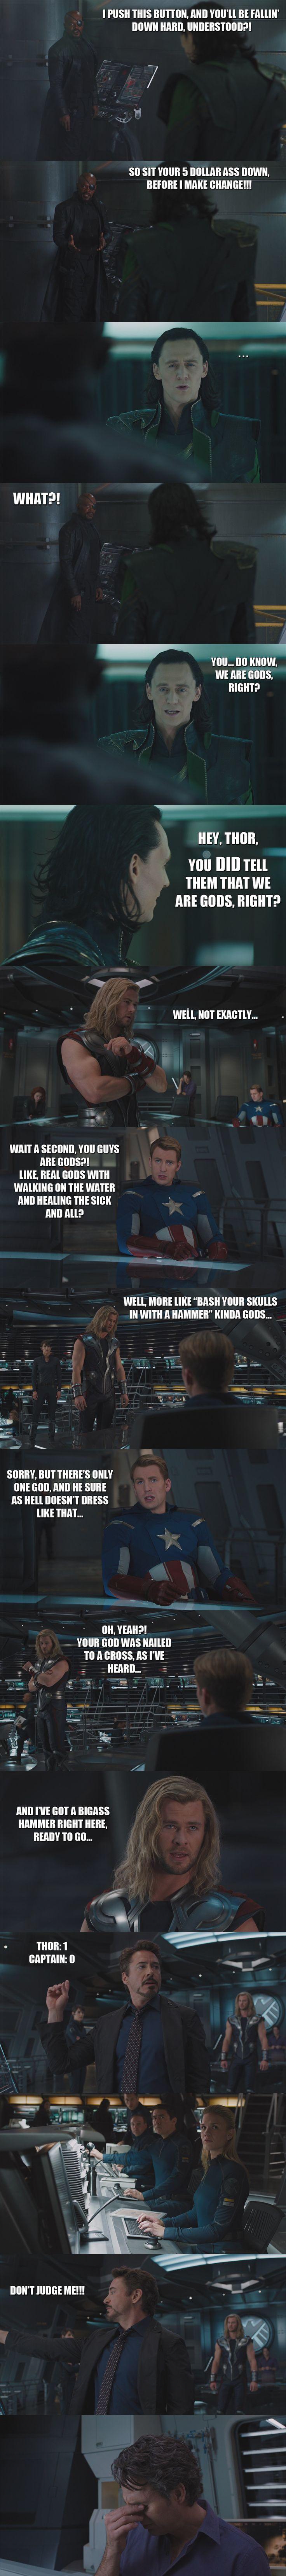 The Avengers - Gods: I by ~yourparodies on deviantART